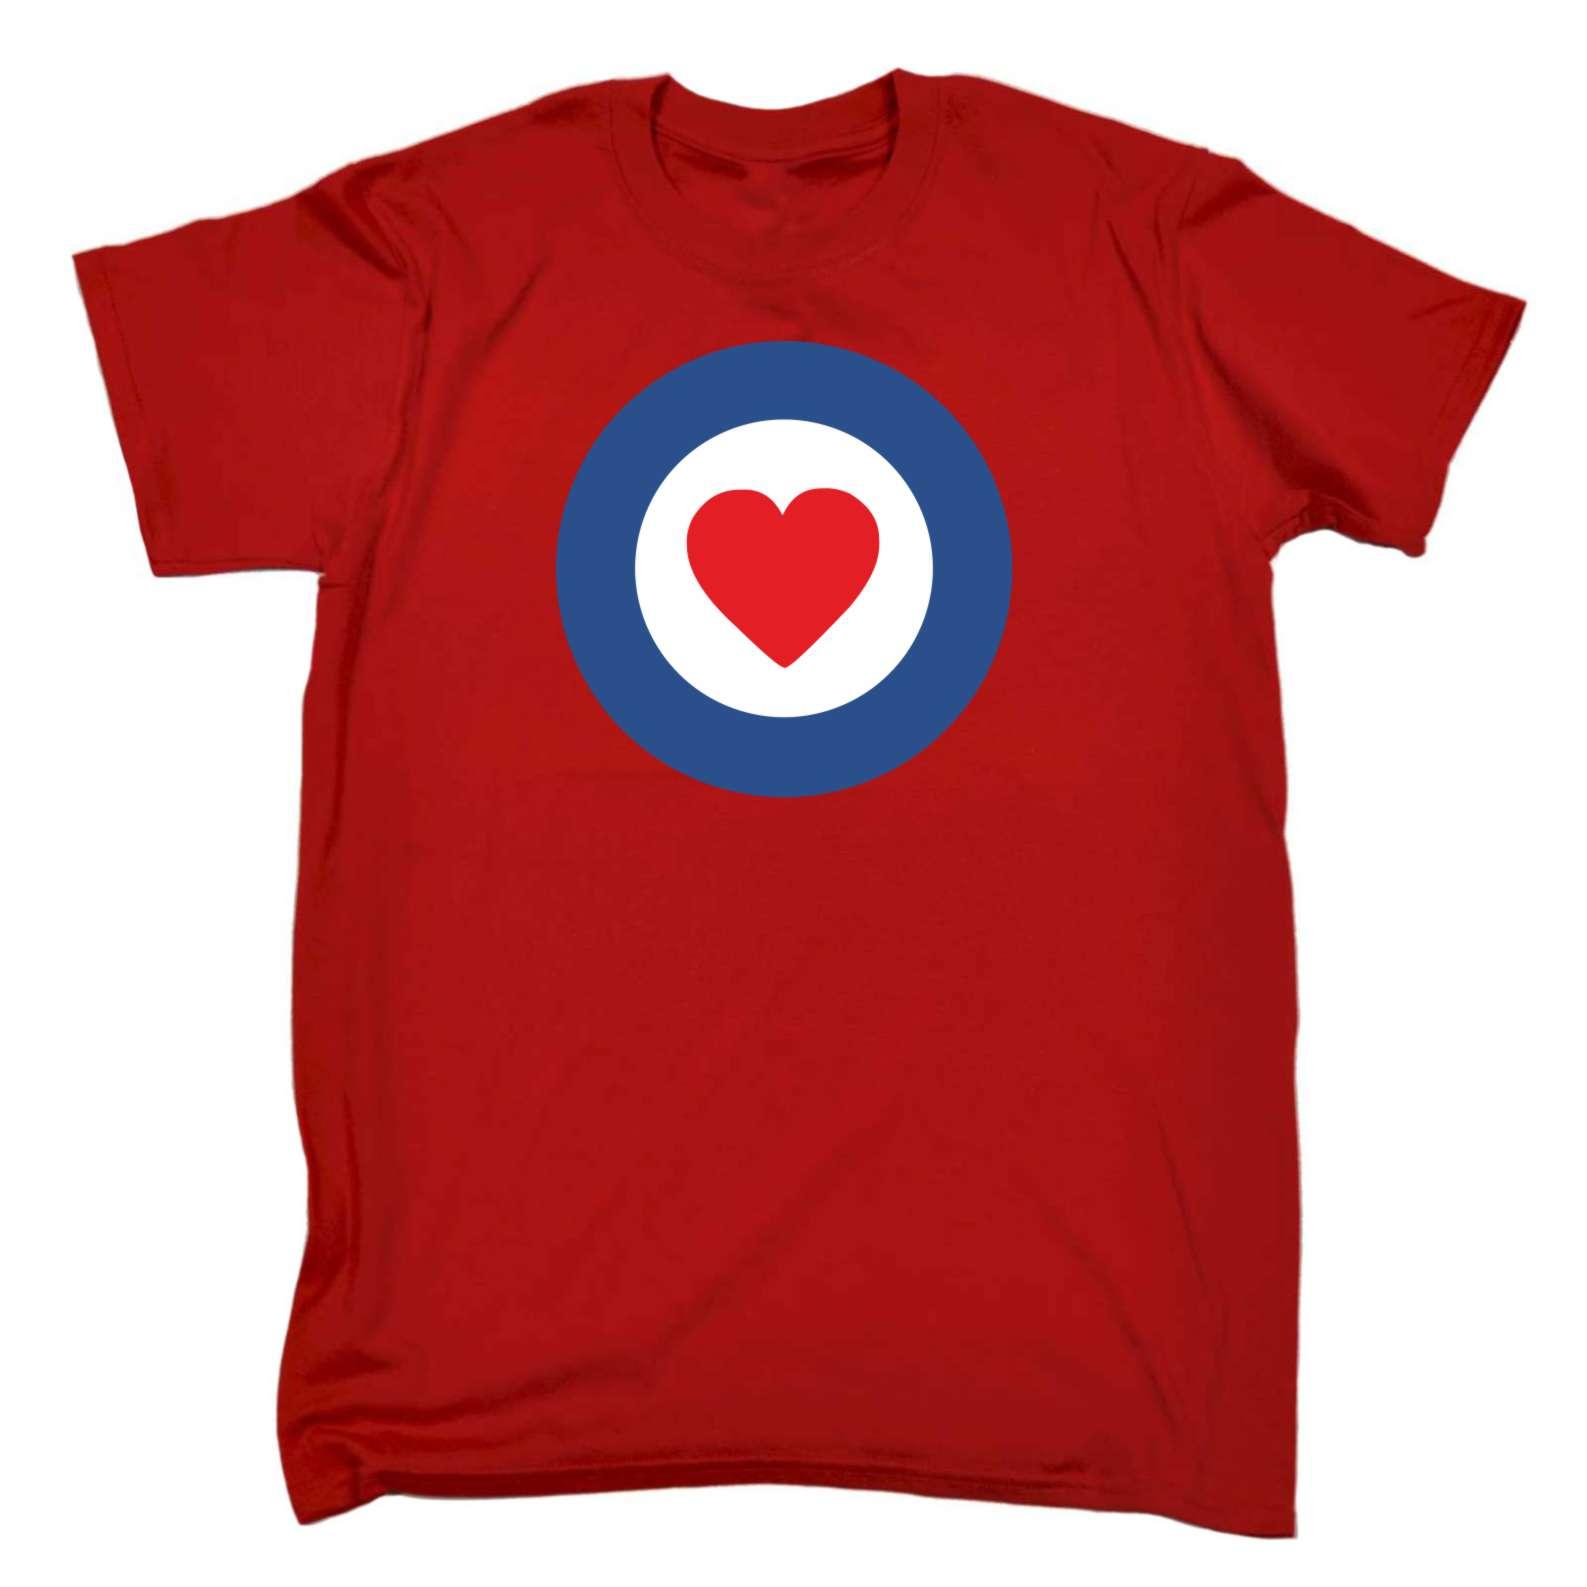 Funny T Shirt Target Heart Love Boyfriend Girlfriend